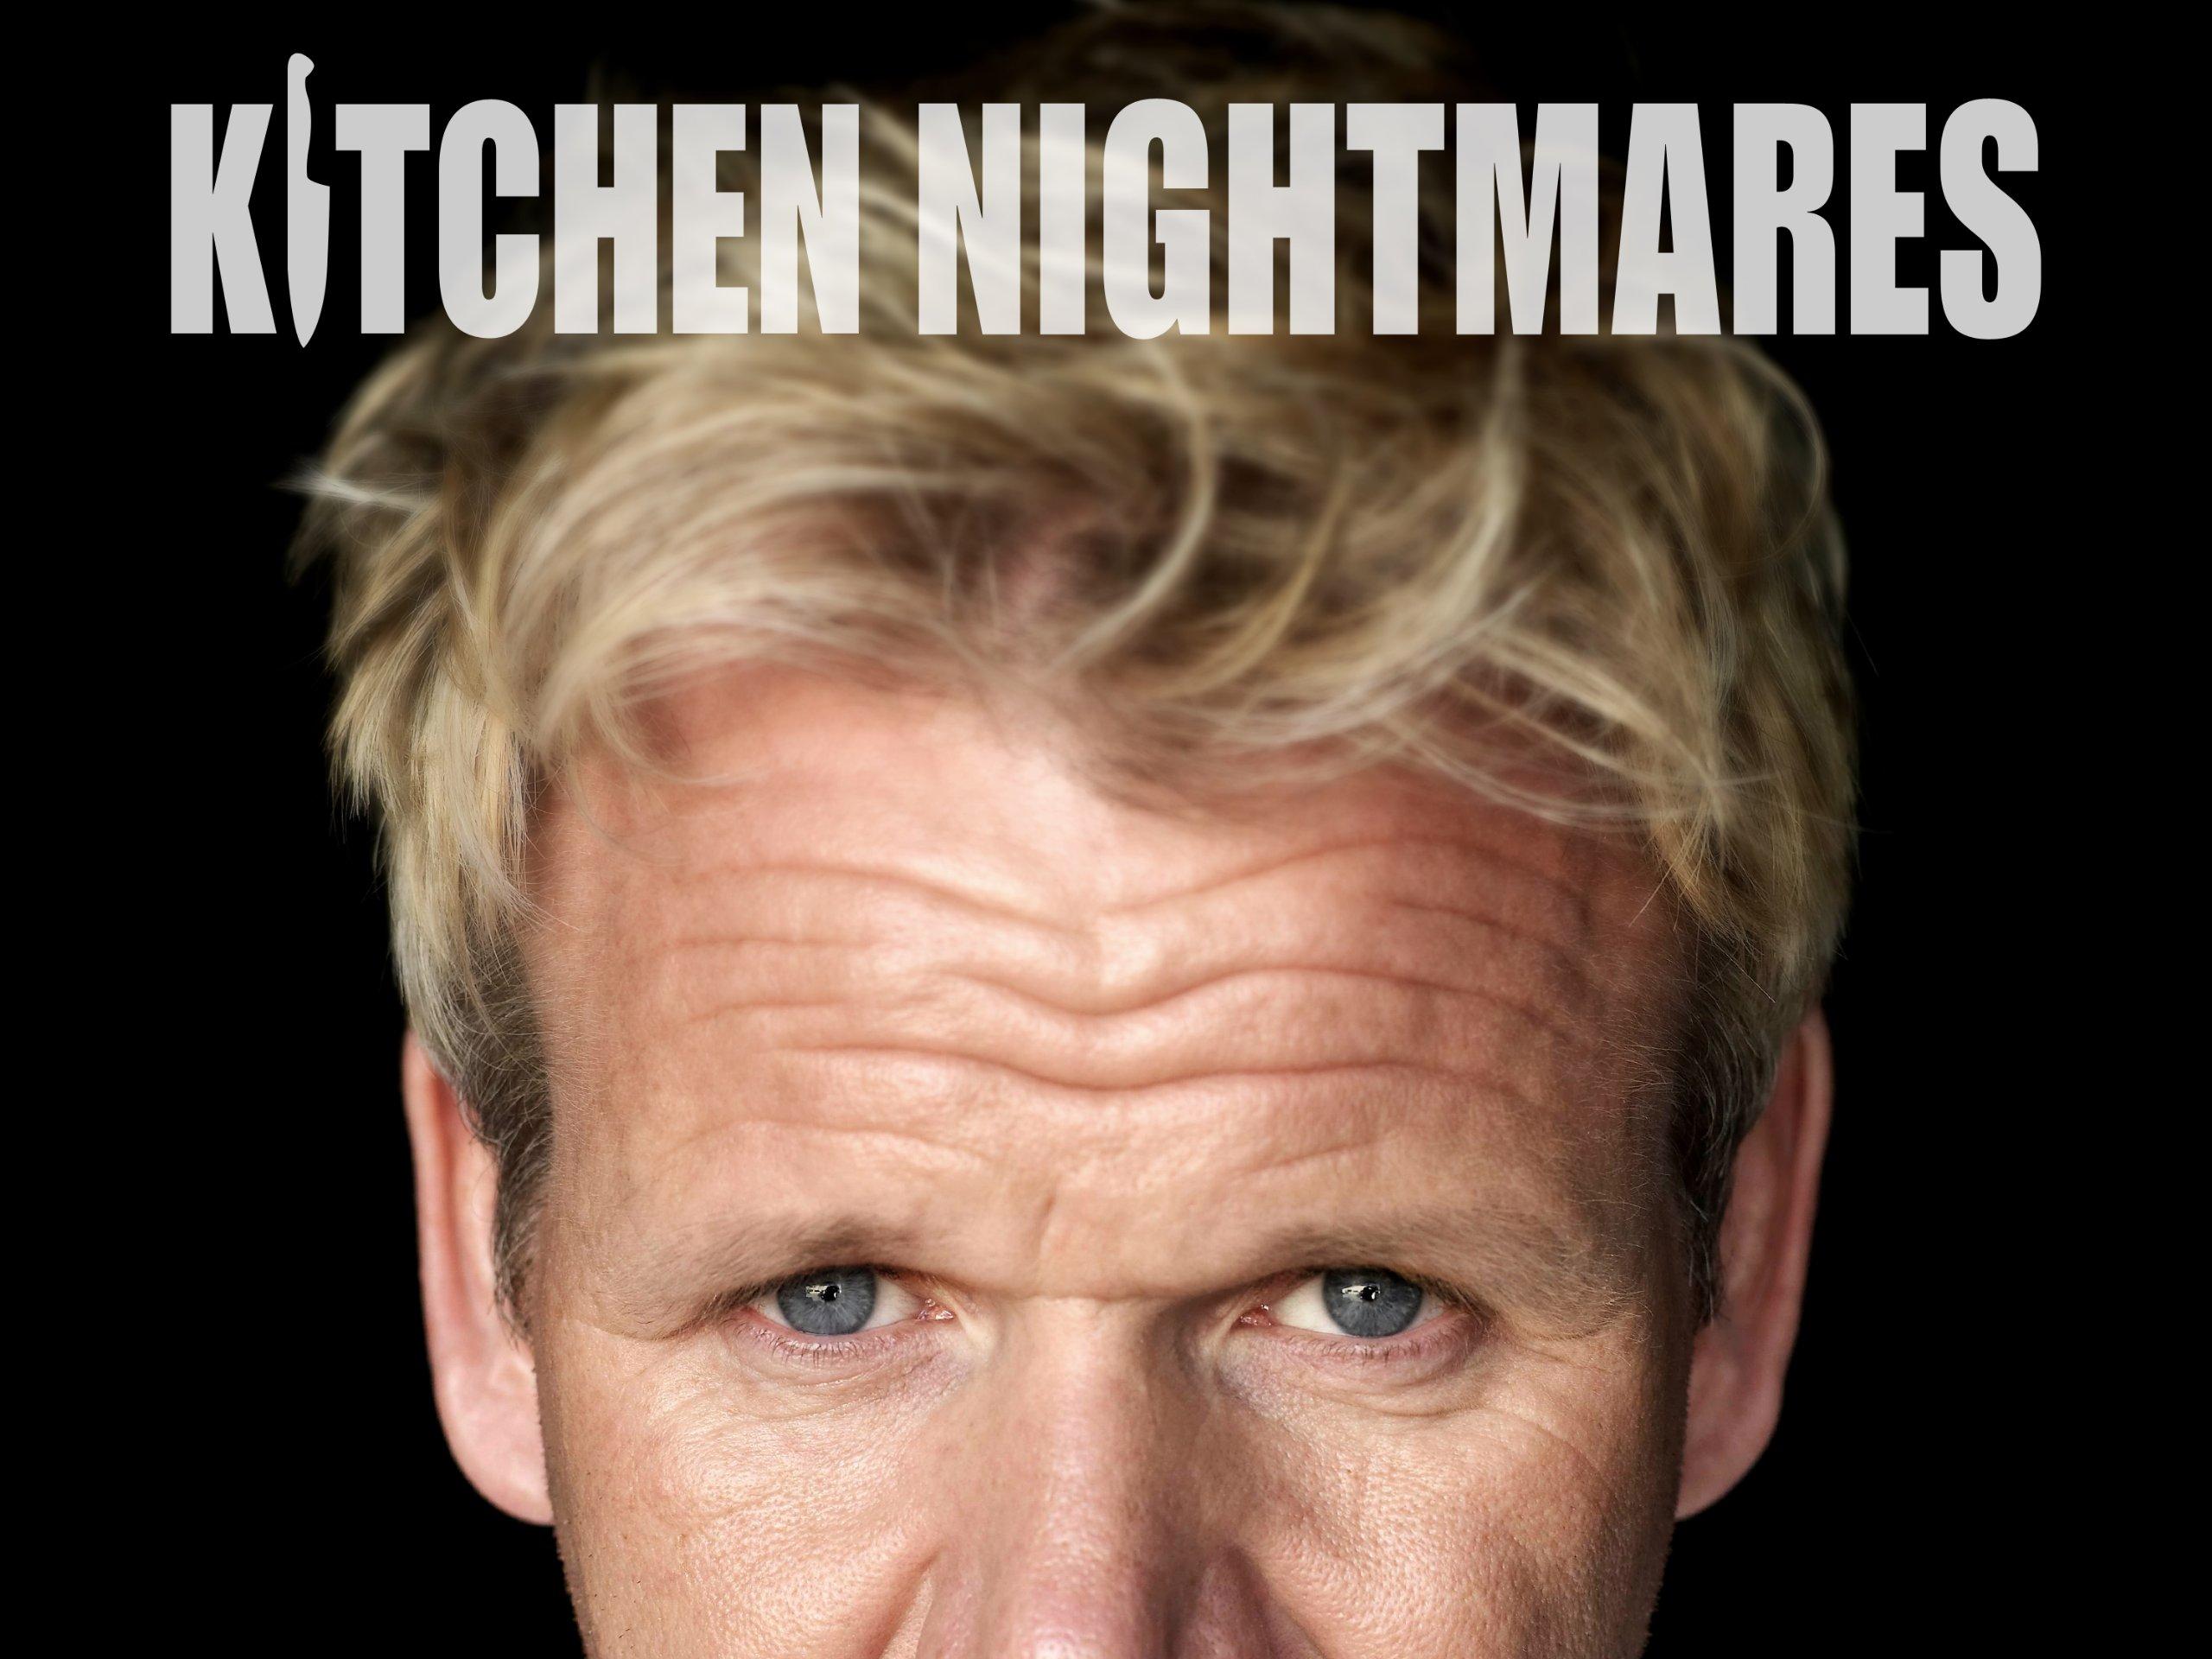 amazon com kitchen nightmares season 5 amazon digital services llc